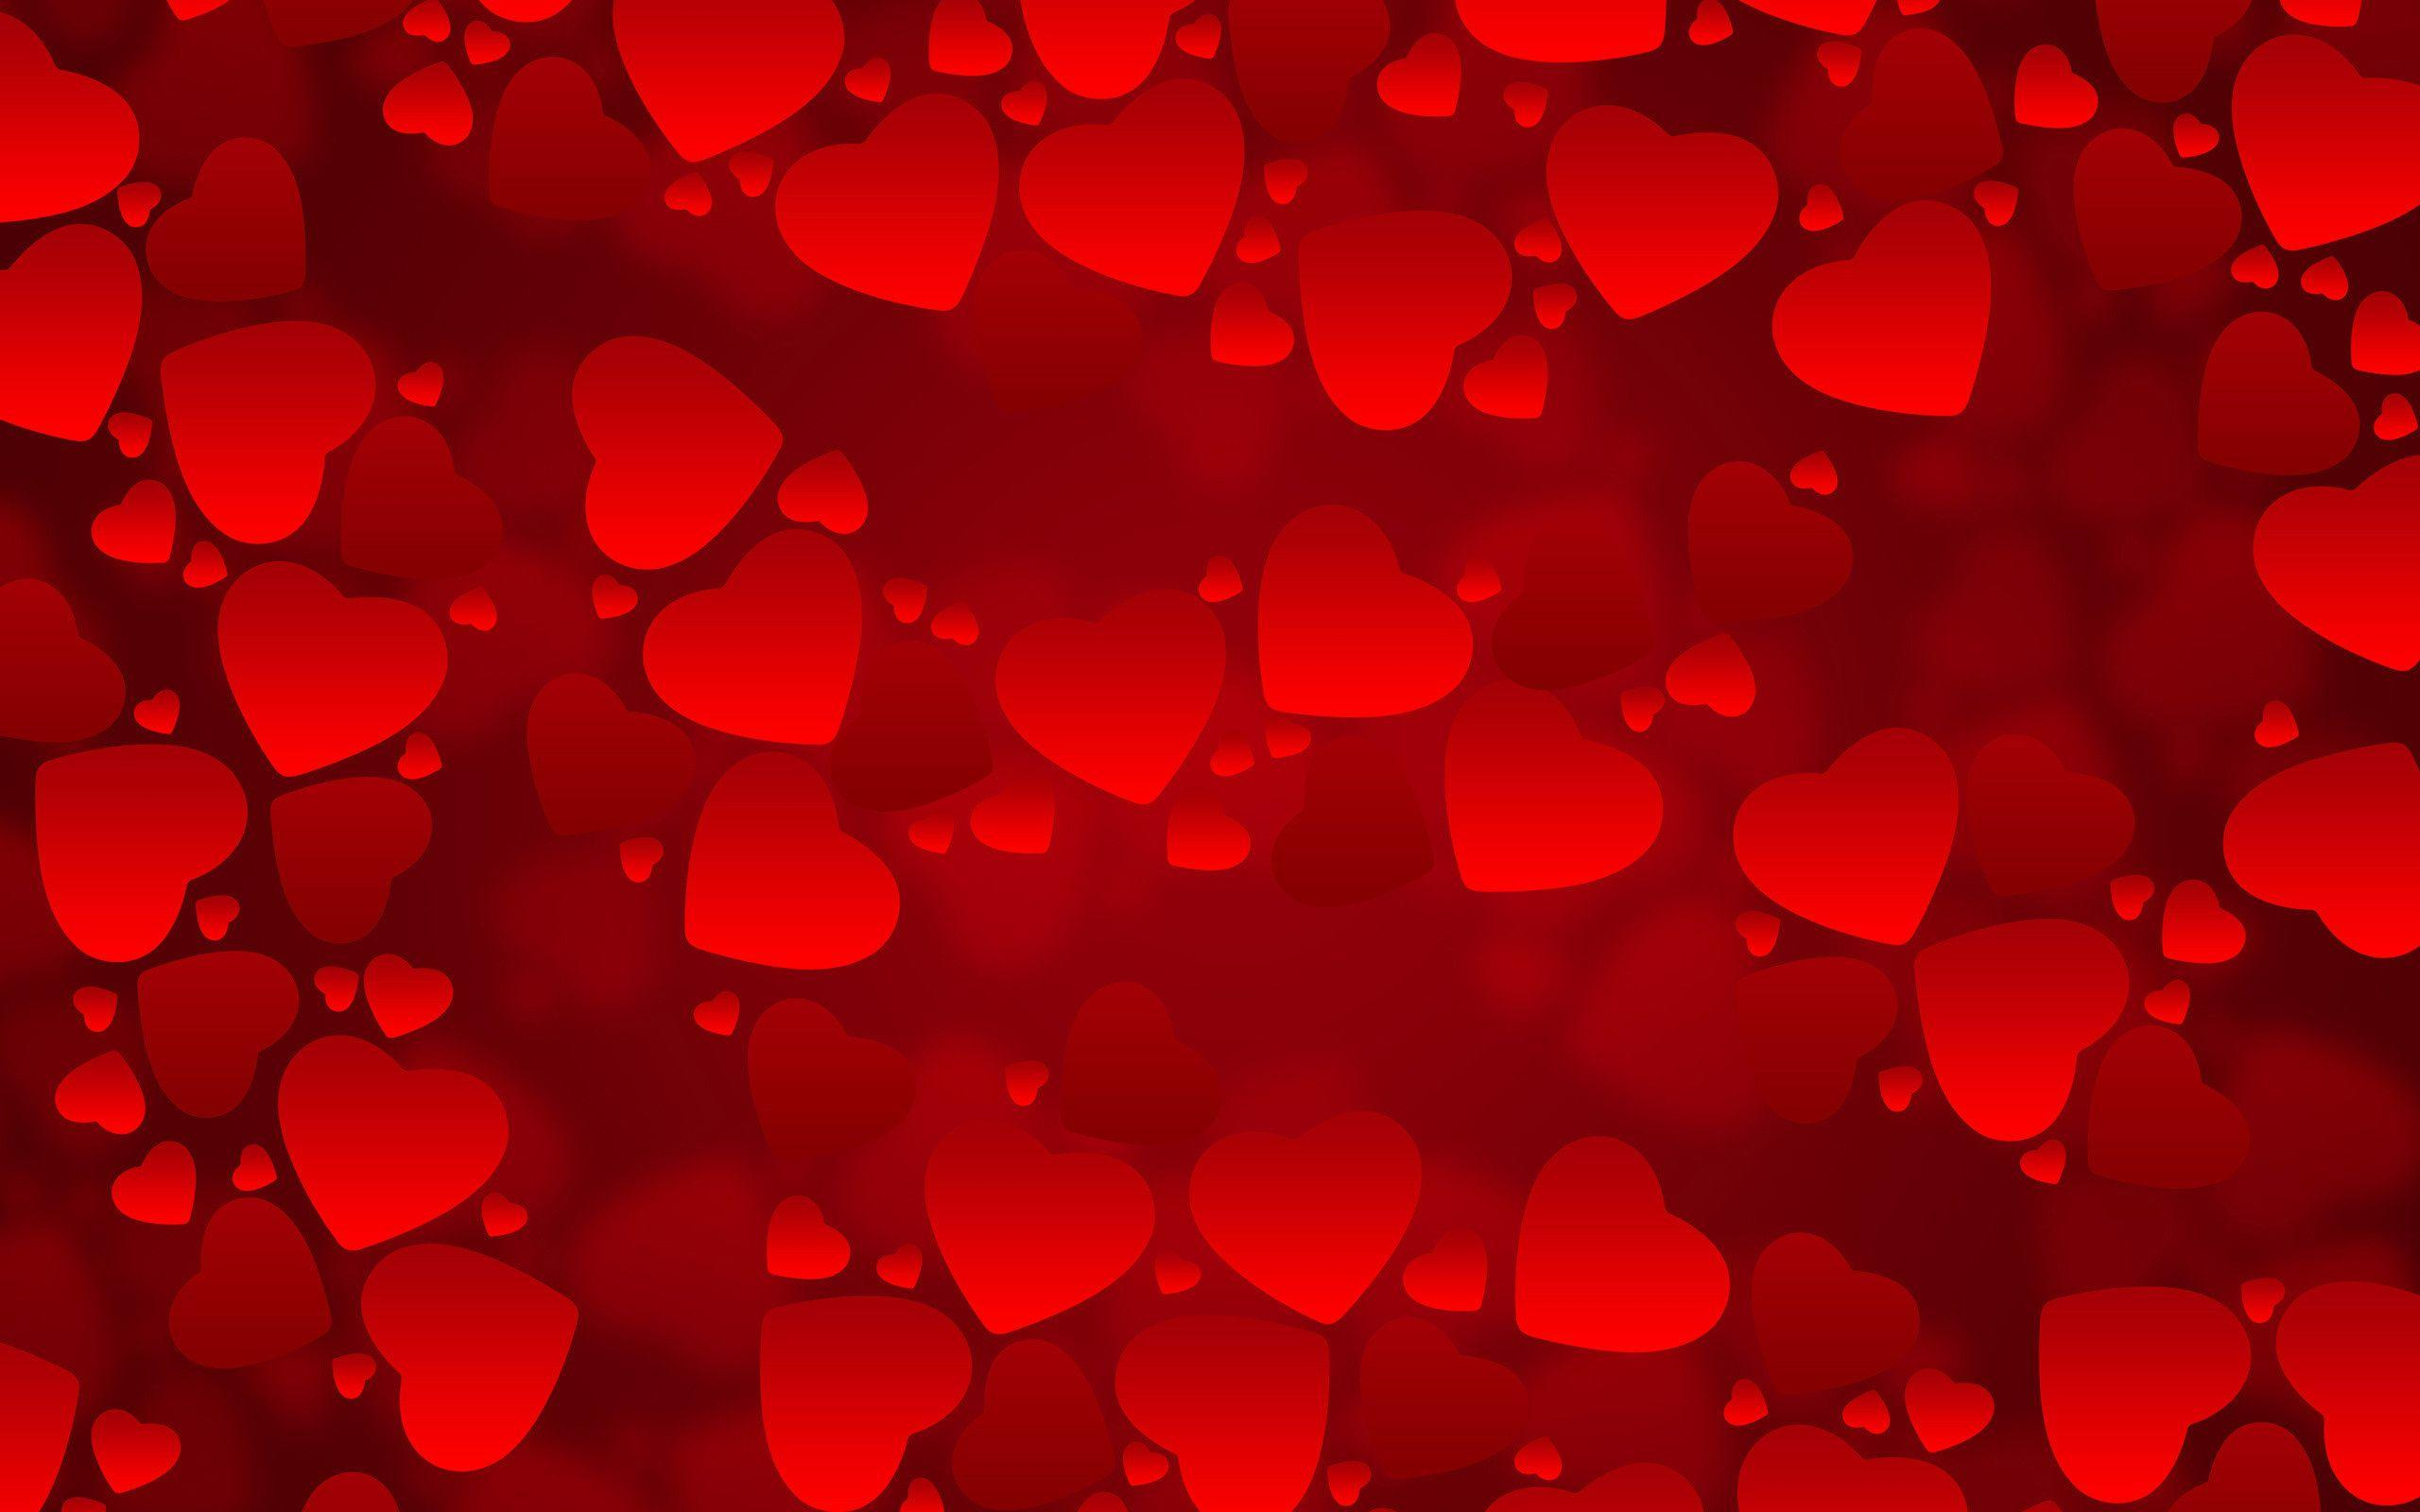 Free Valentines Desktop Backgrounds - Wallpaper Cave